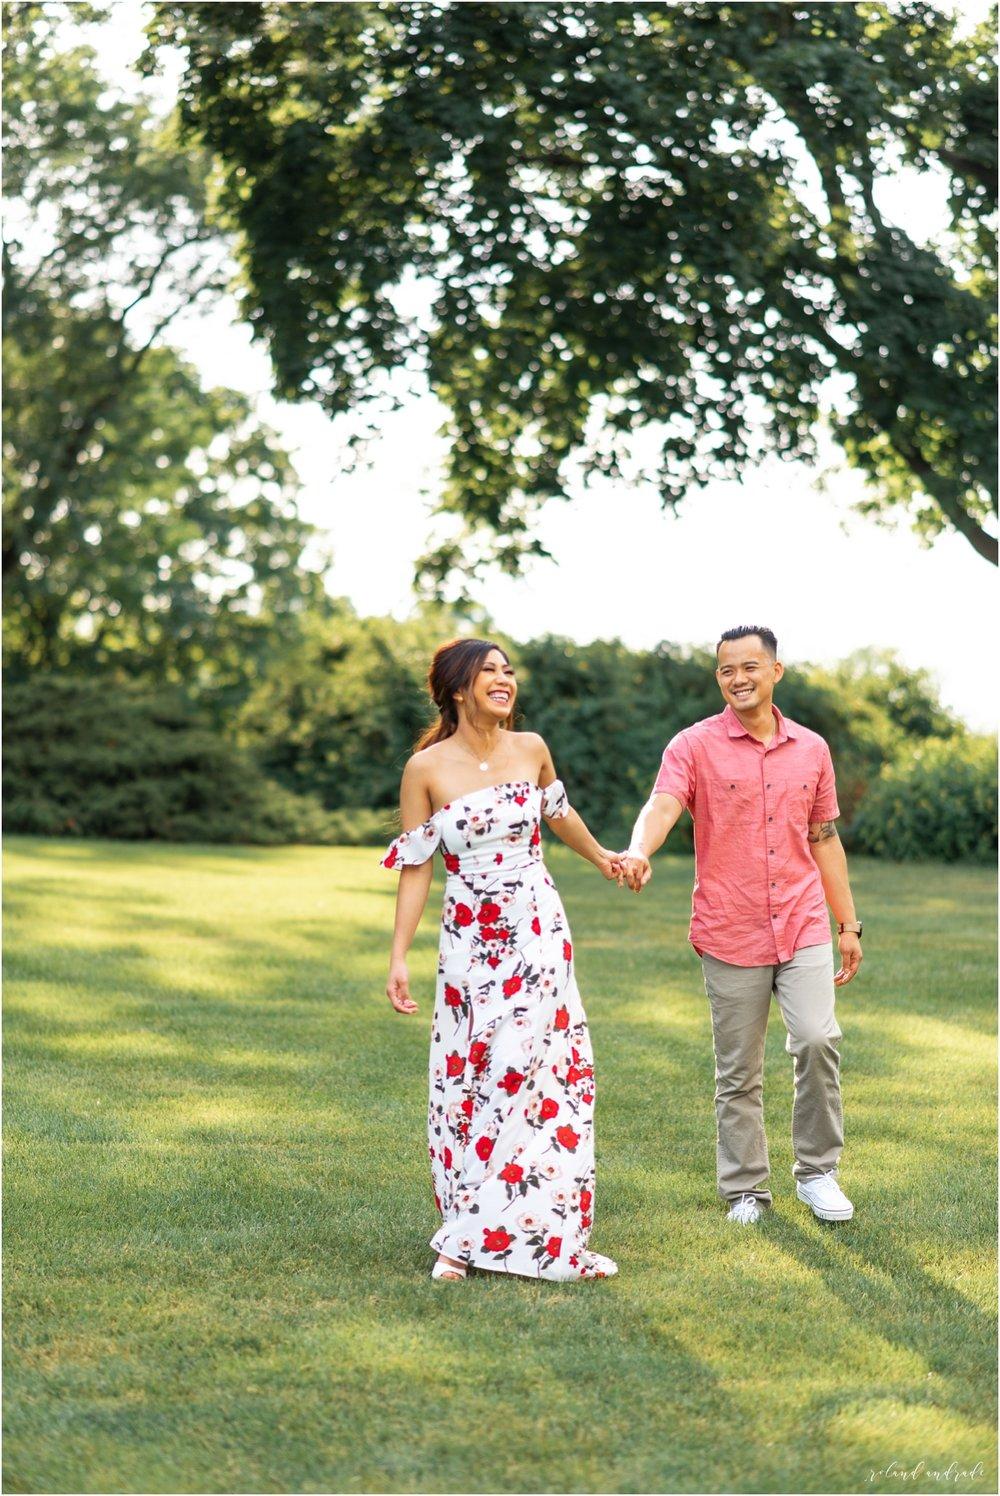 Cantigny Park Engagement Session, Wheaton Illinois Engagement Session, Chicago Wedding Photographer, Naperville Wedding Photographer, Aurora Wedding Photographer_0014.jpg